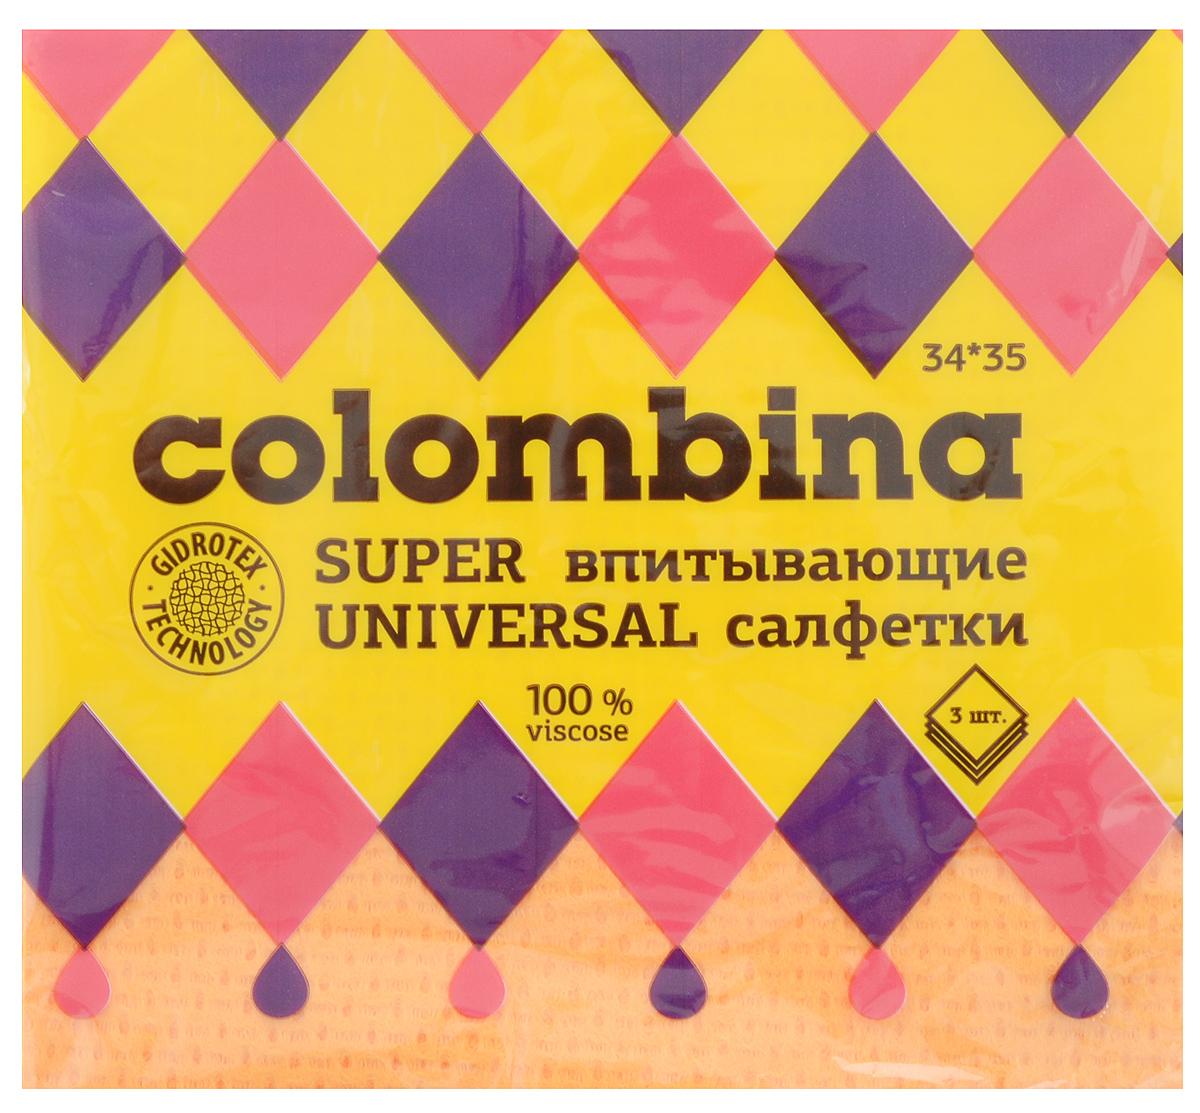 Набор салфеток Colombina Universal, супервпитывающие, цвет: оранжевый, 34 х 35 см, 3 шт stylish bible sentence pattern removeable wall sticker